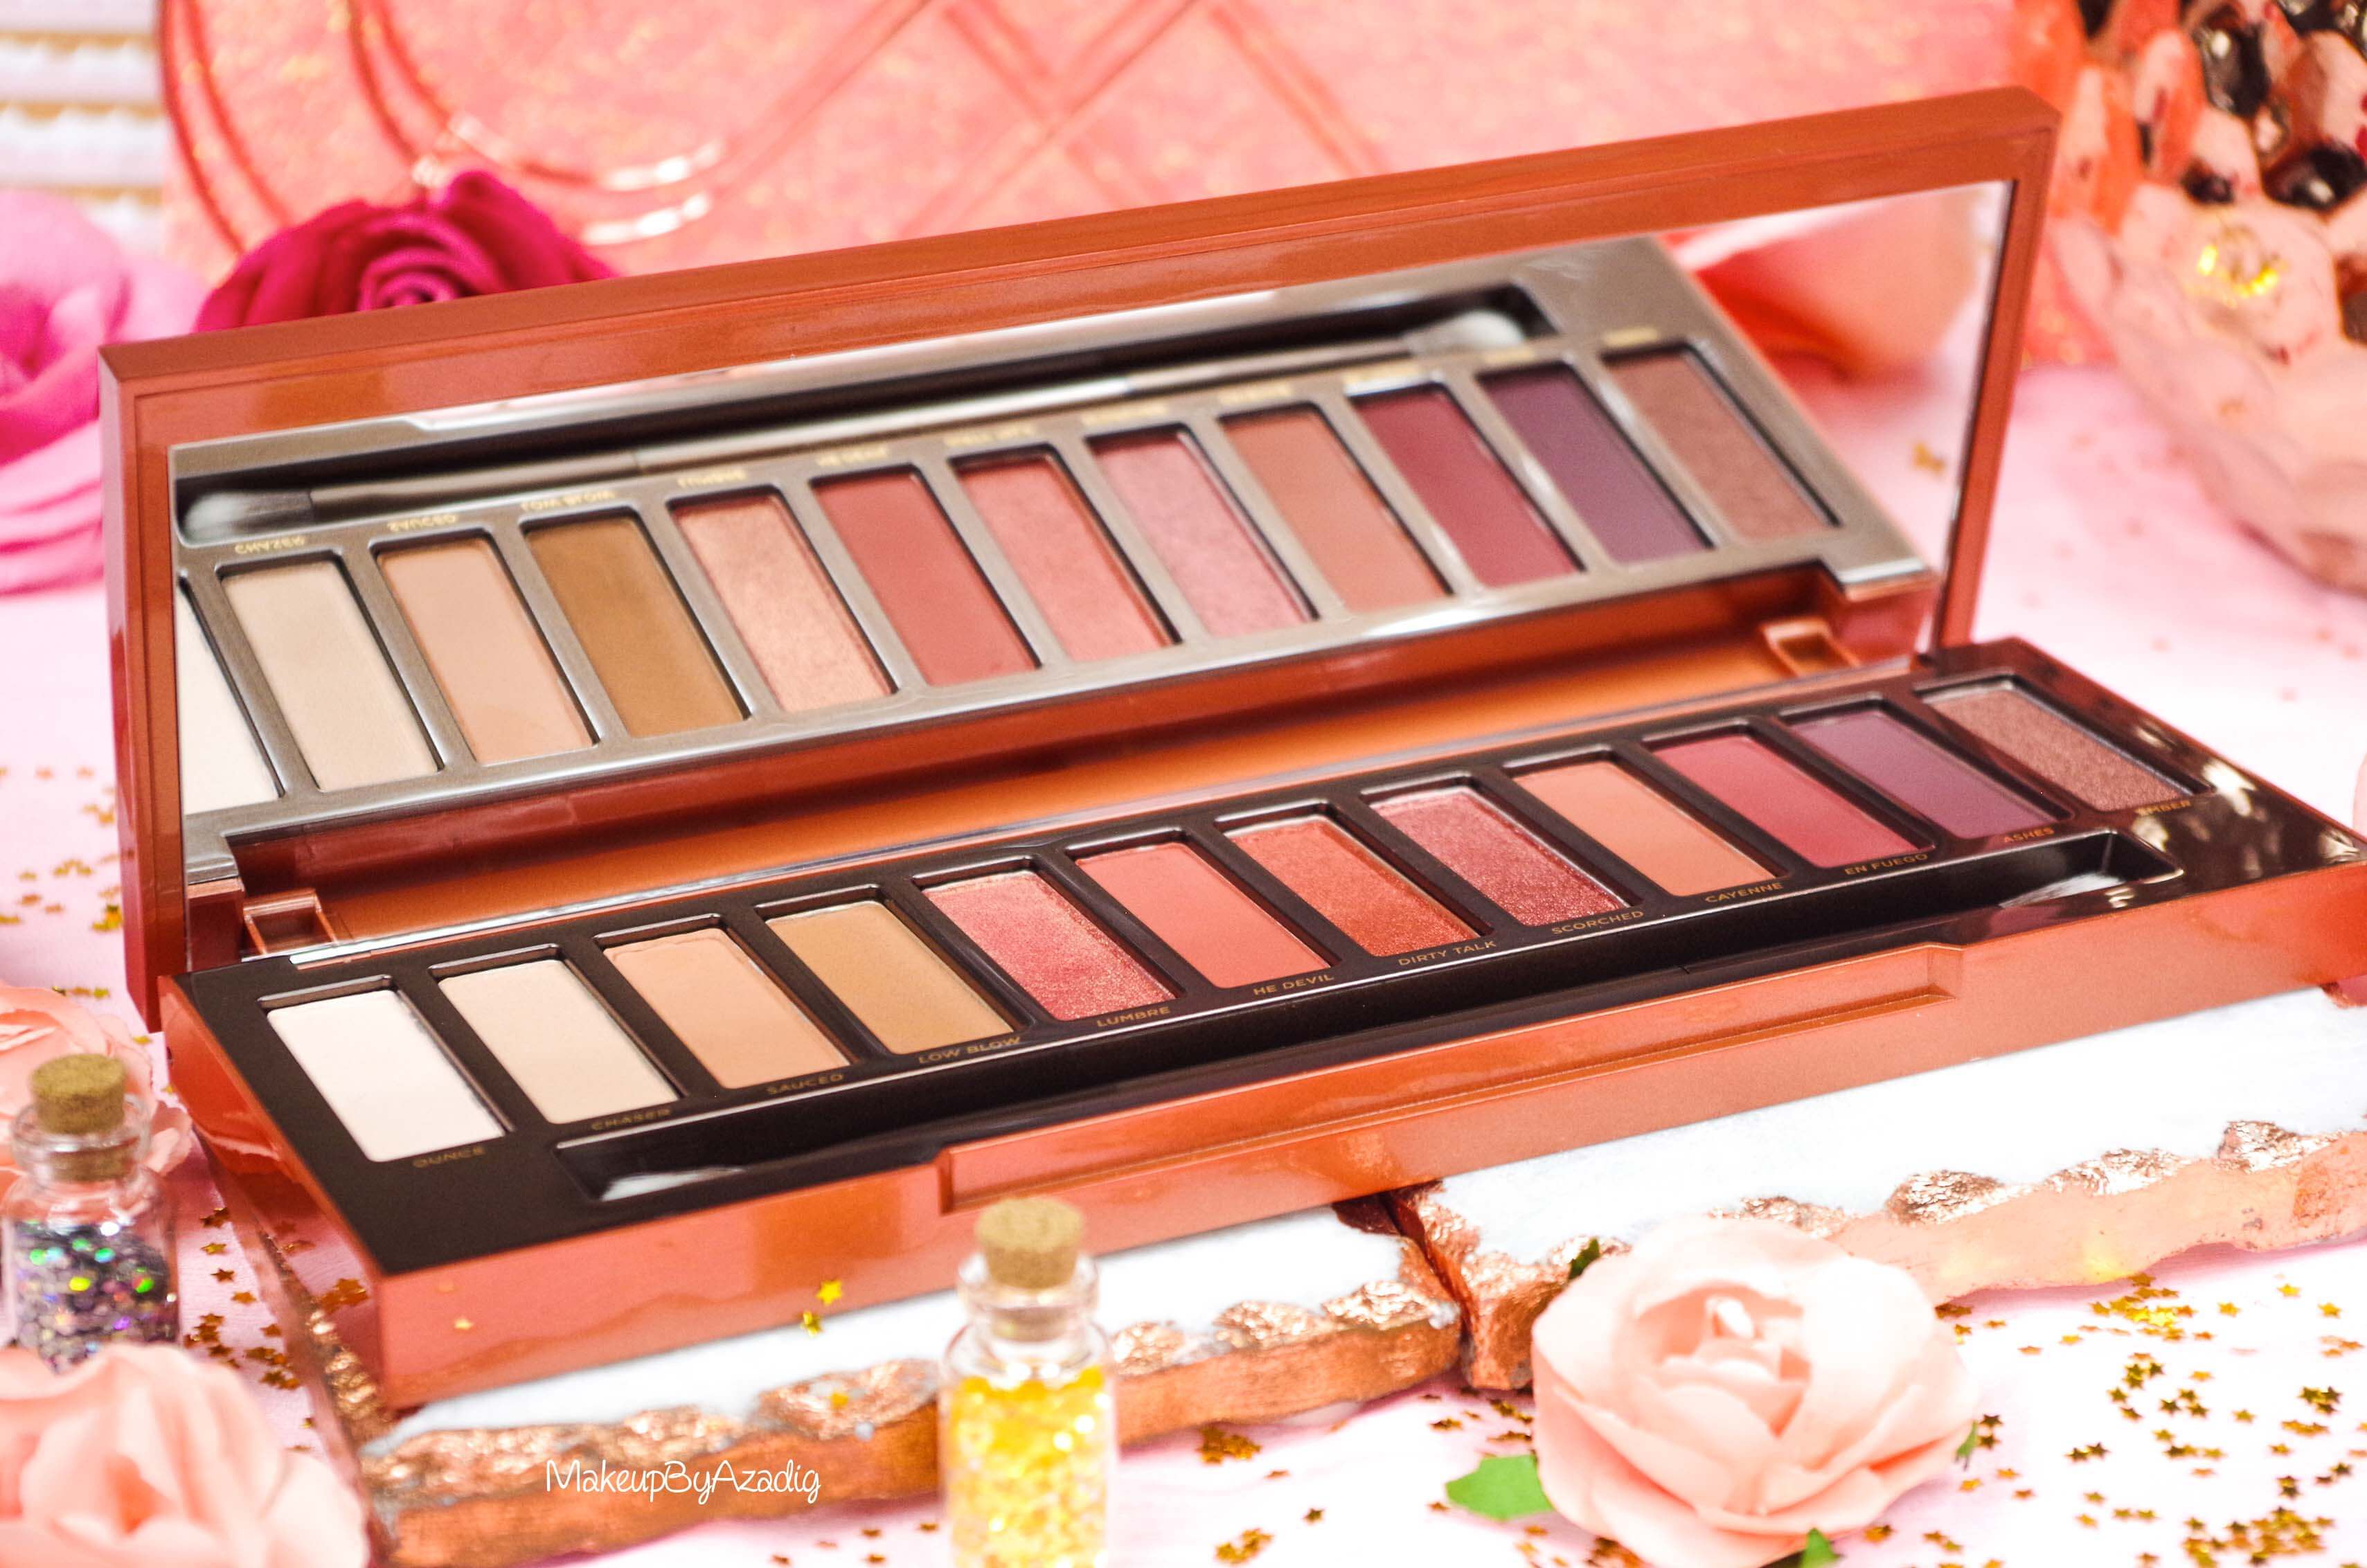 revue-review-nouvelle-palette-naked-heat-urban-decay-sephora-avis-prix-france-makeupbyazadig-swatch-miror